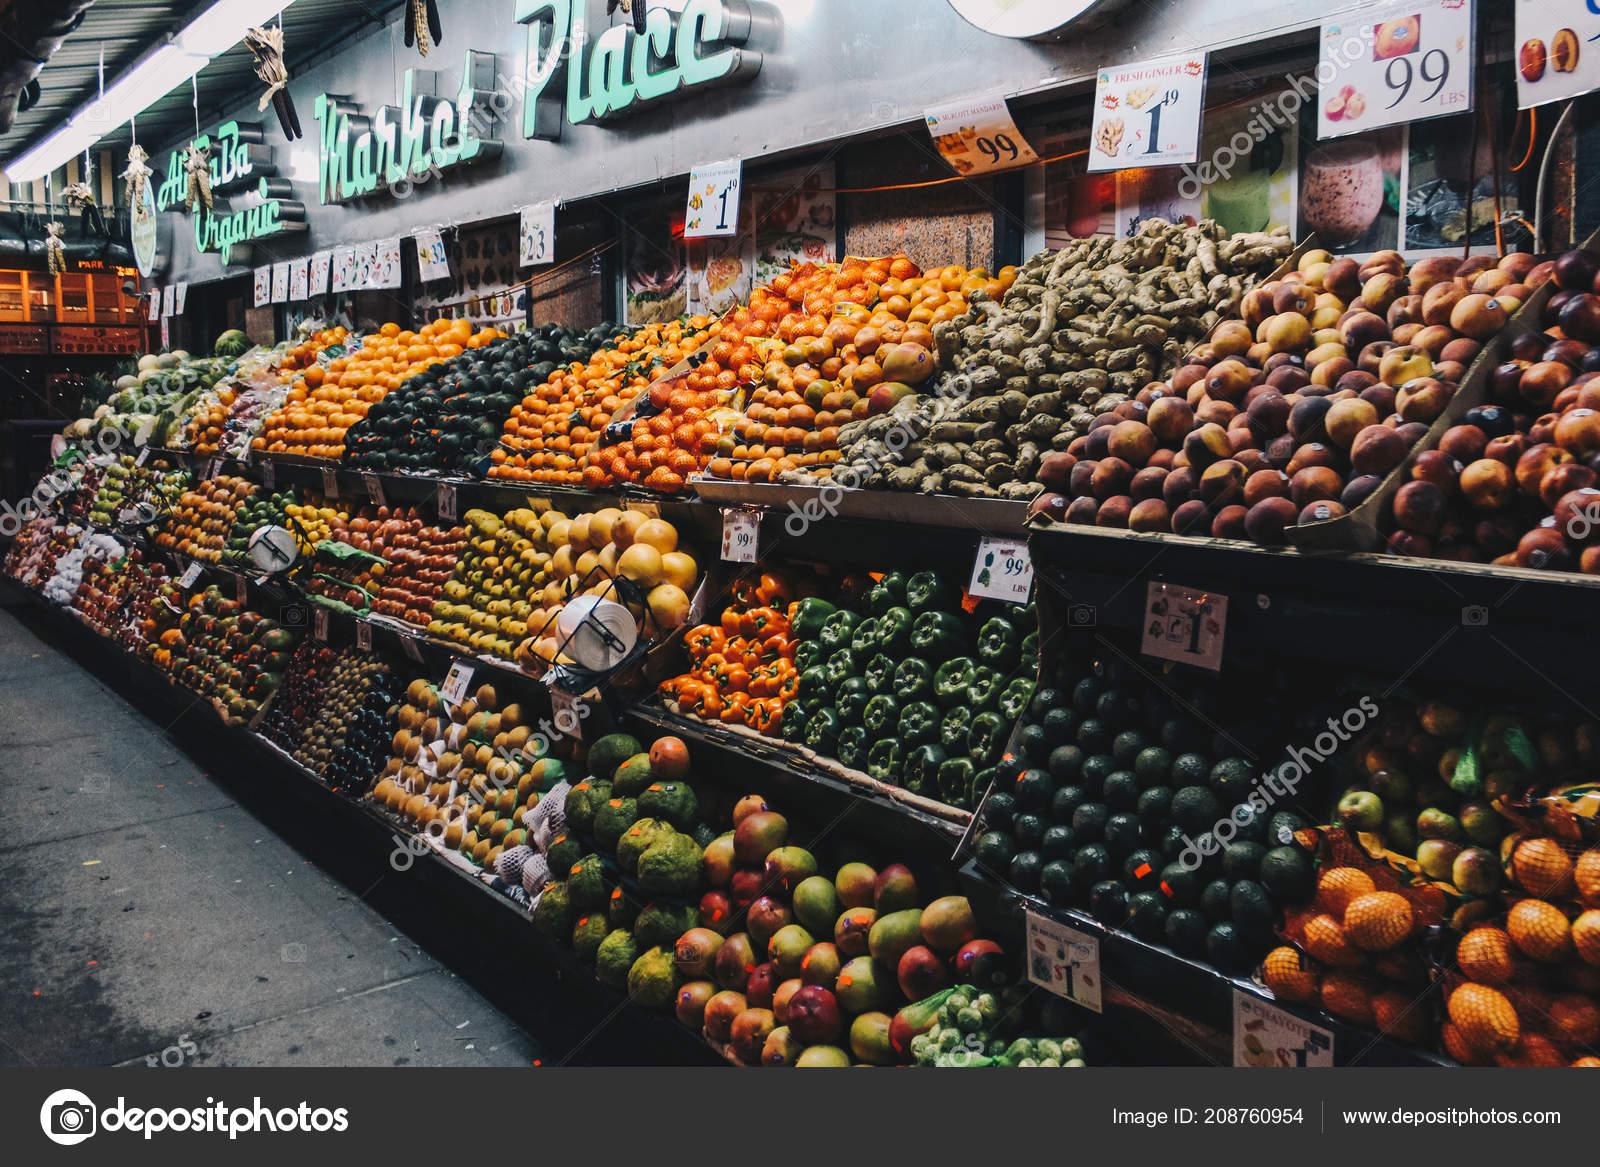 Produce Market Chinatown Nyc Stock Photo C Cranford Brandon Gmail Com 208760954